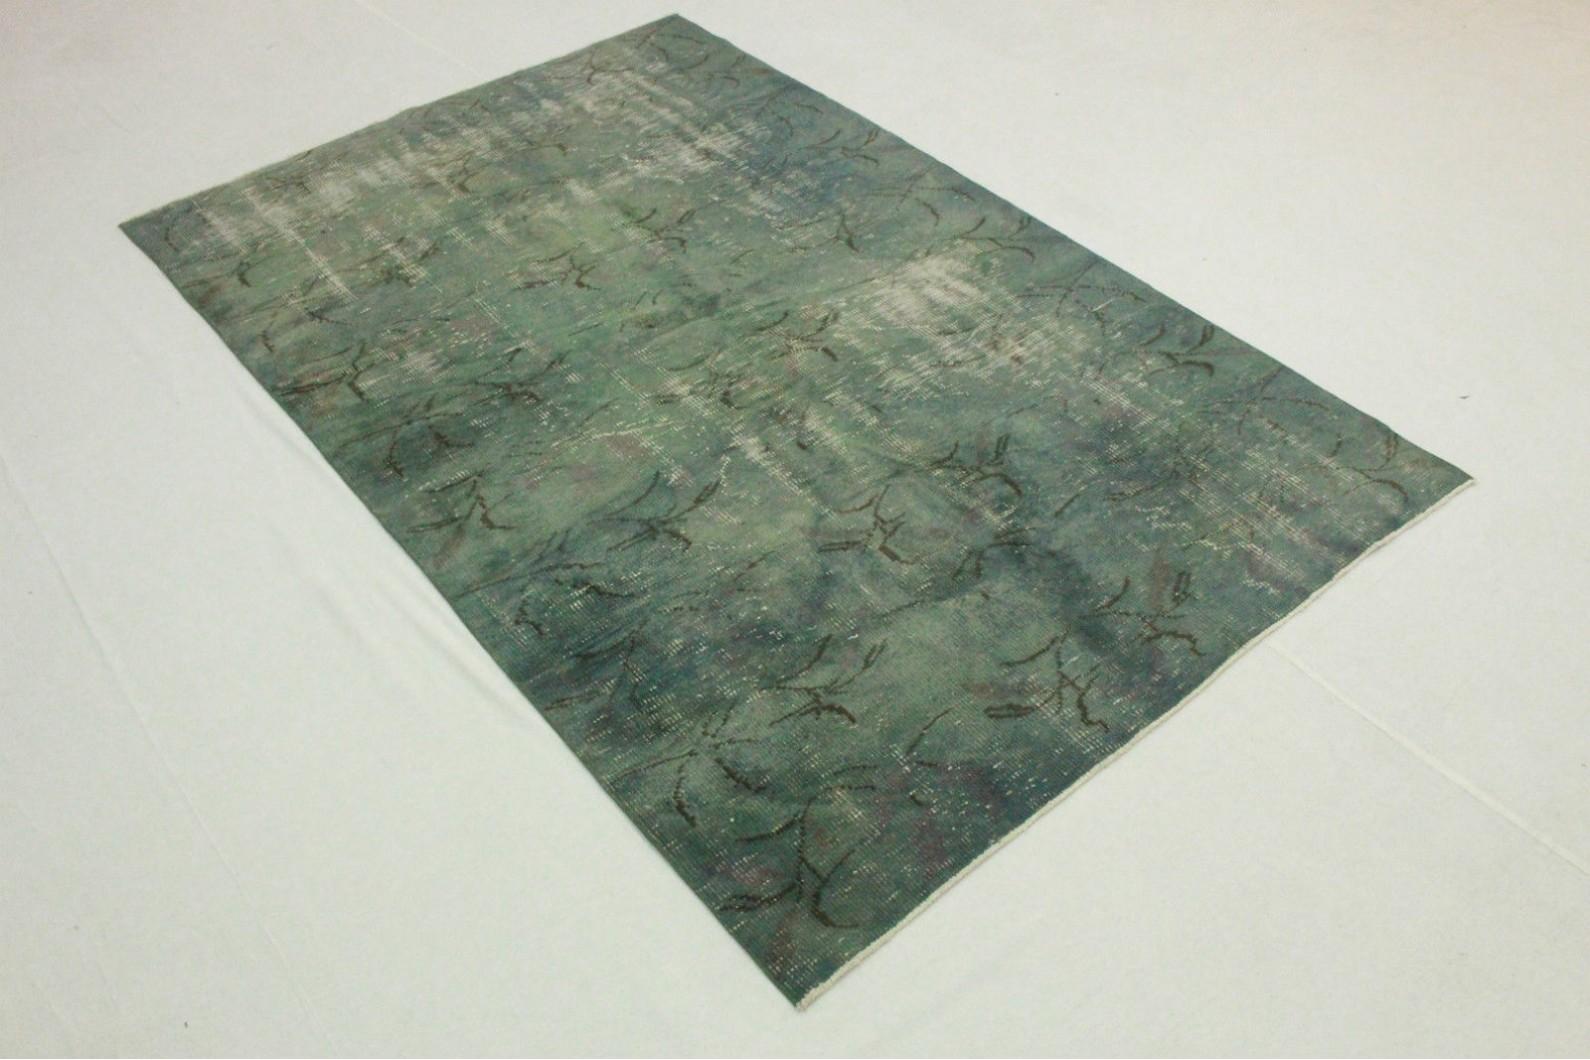 vintage teppich blau grau in 250x160cm 1011 5116 bei. Black Bedroom Furniture Sets. Home Design Ideas